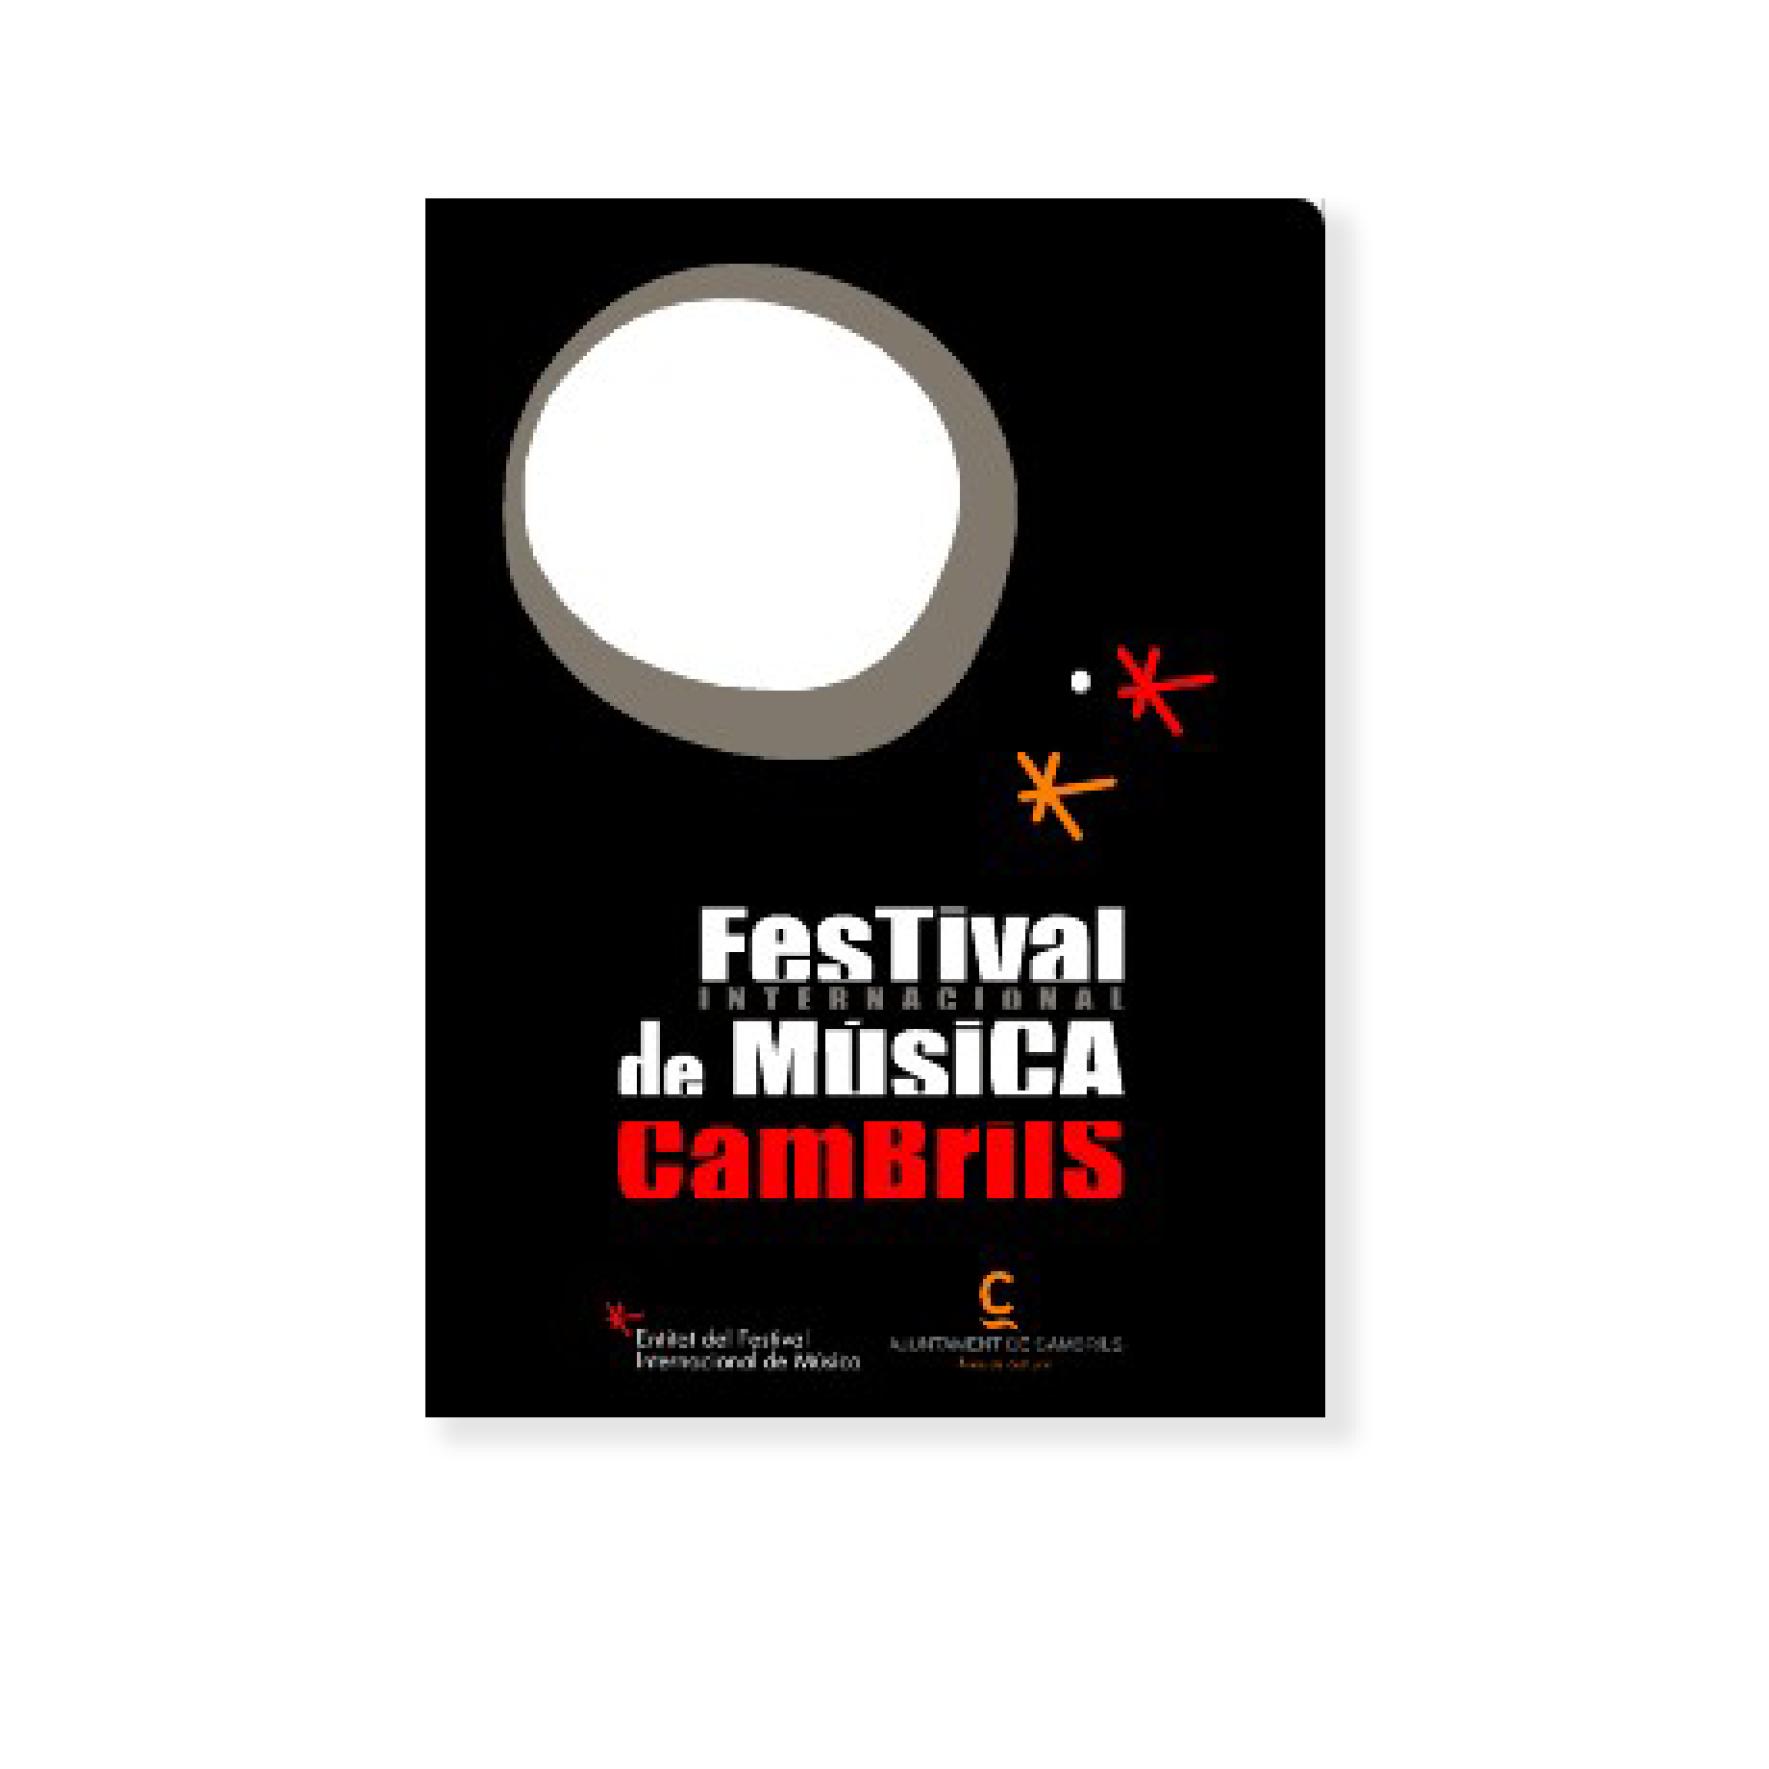 adezeta_festival1